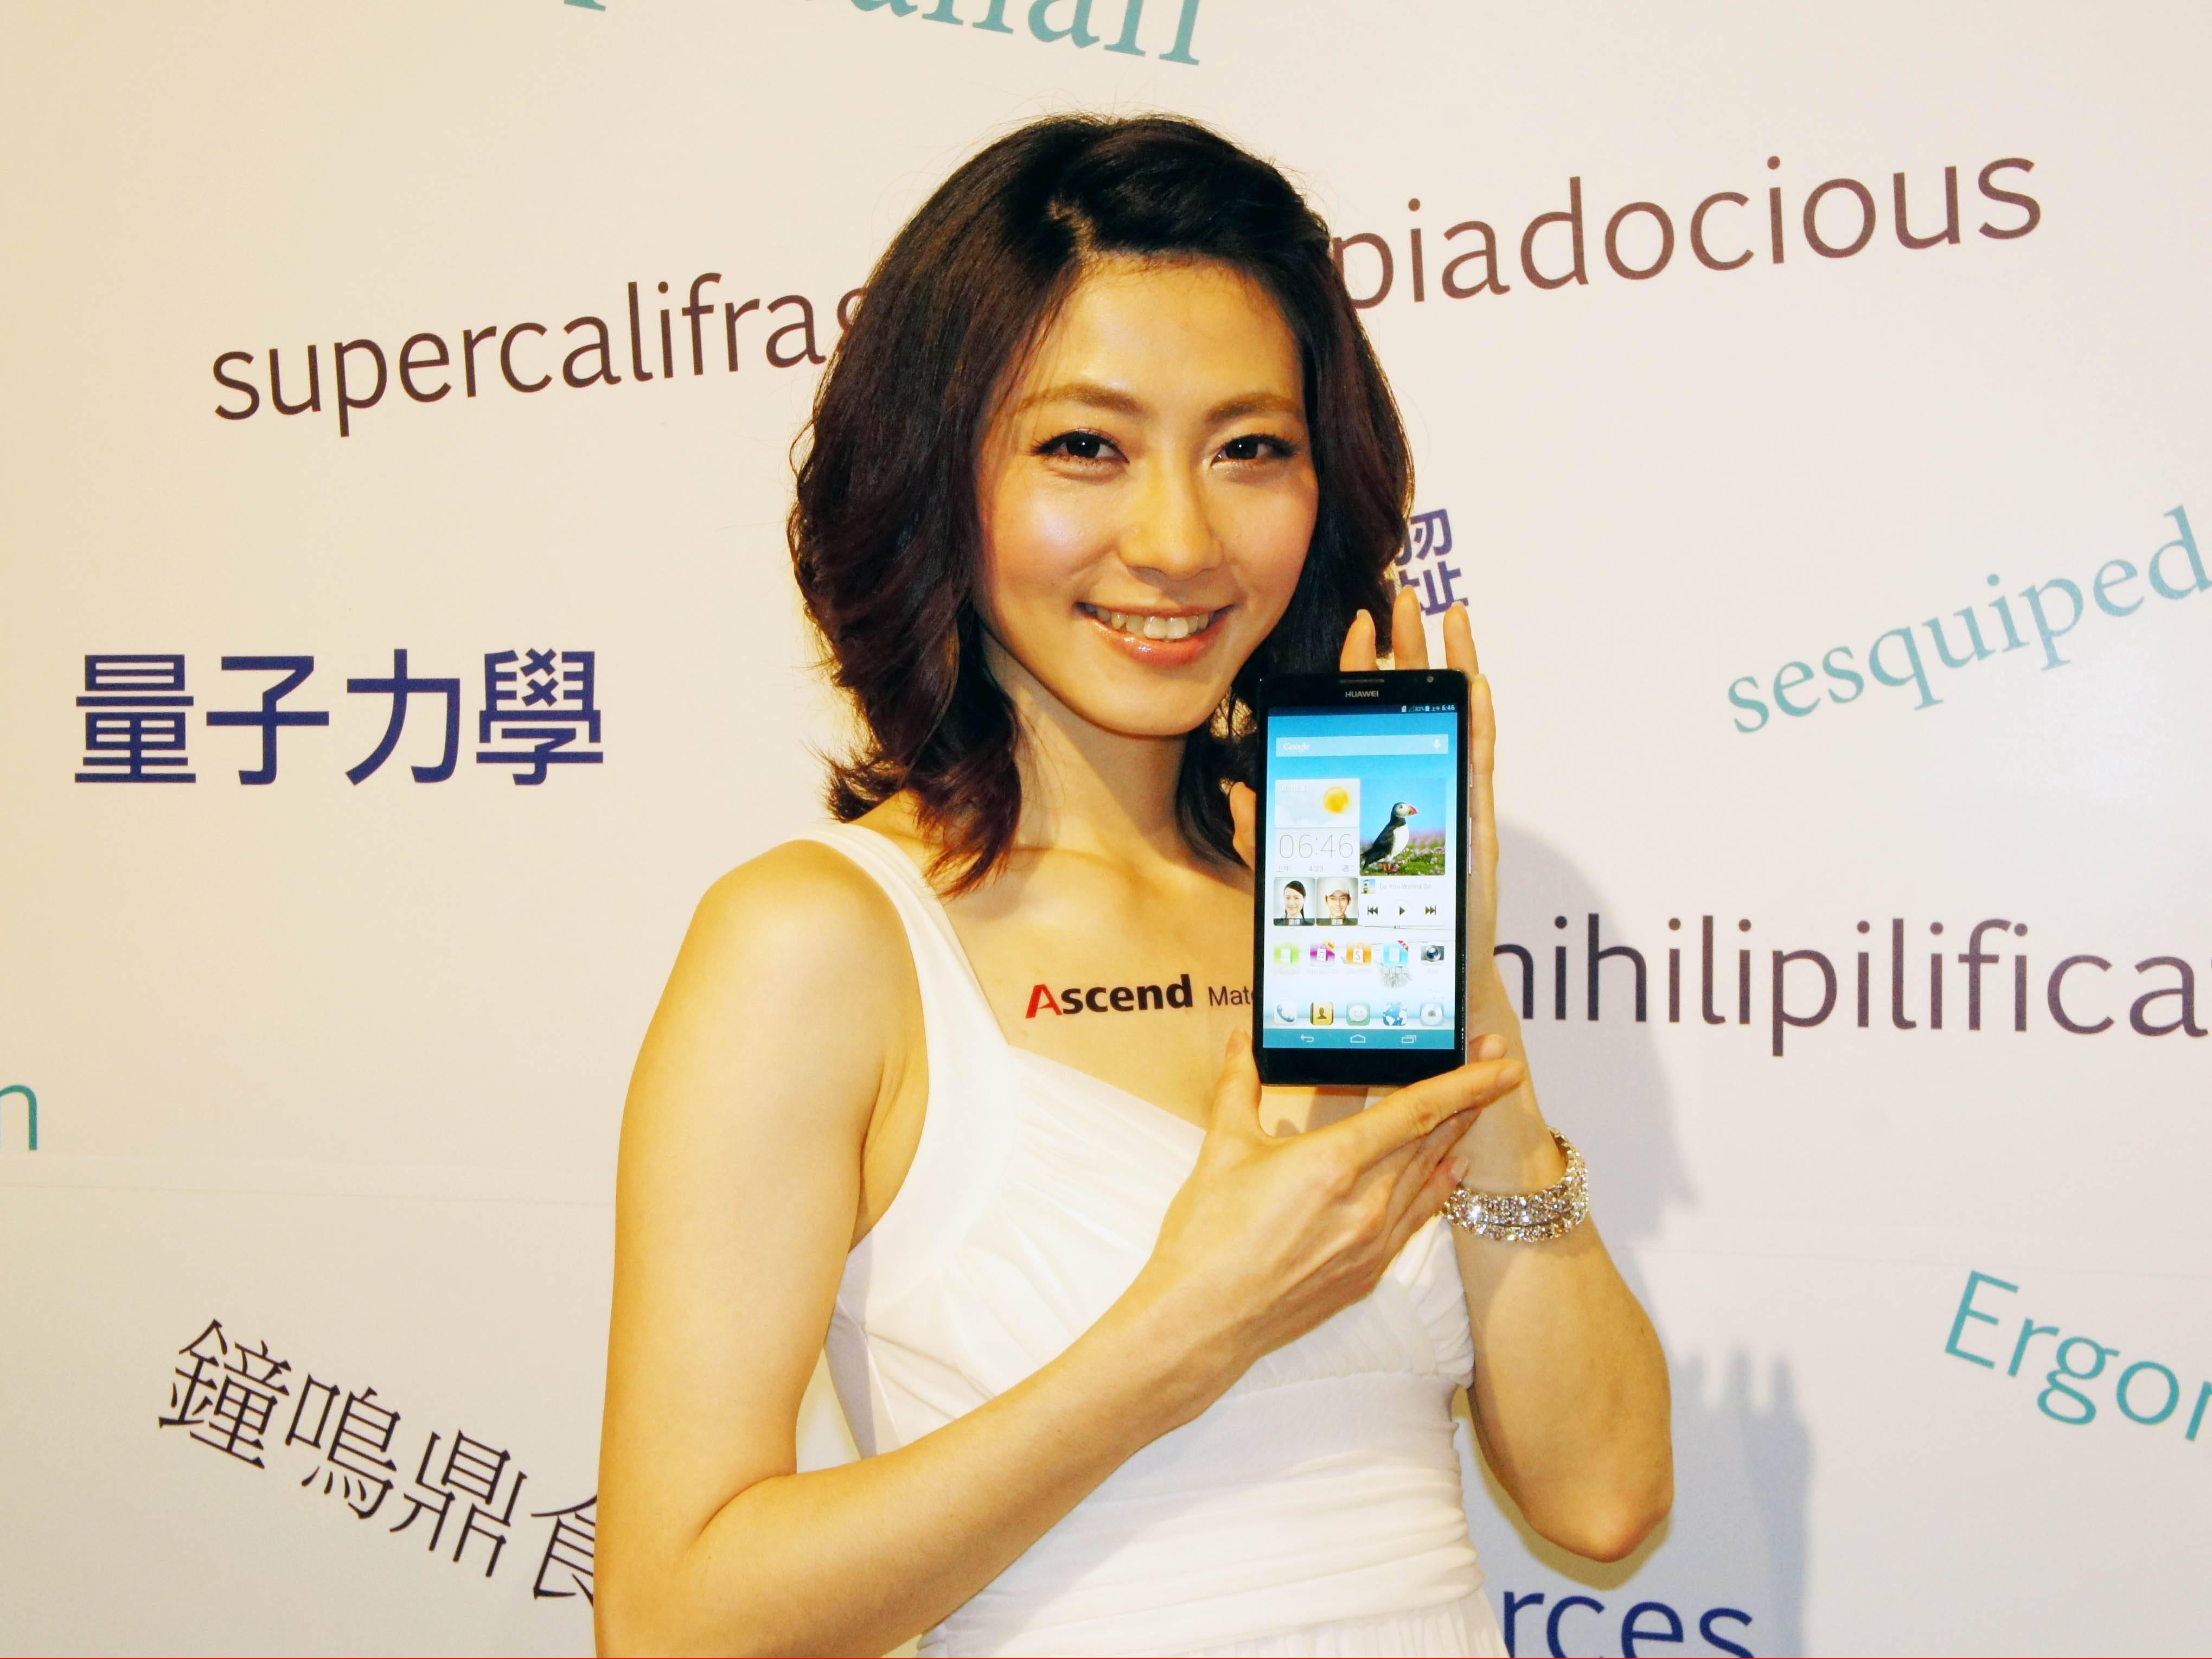 Huawei 6.1吋 Ascend Mate 巨無霸手機動手玩,建議售價 15,490 元